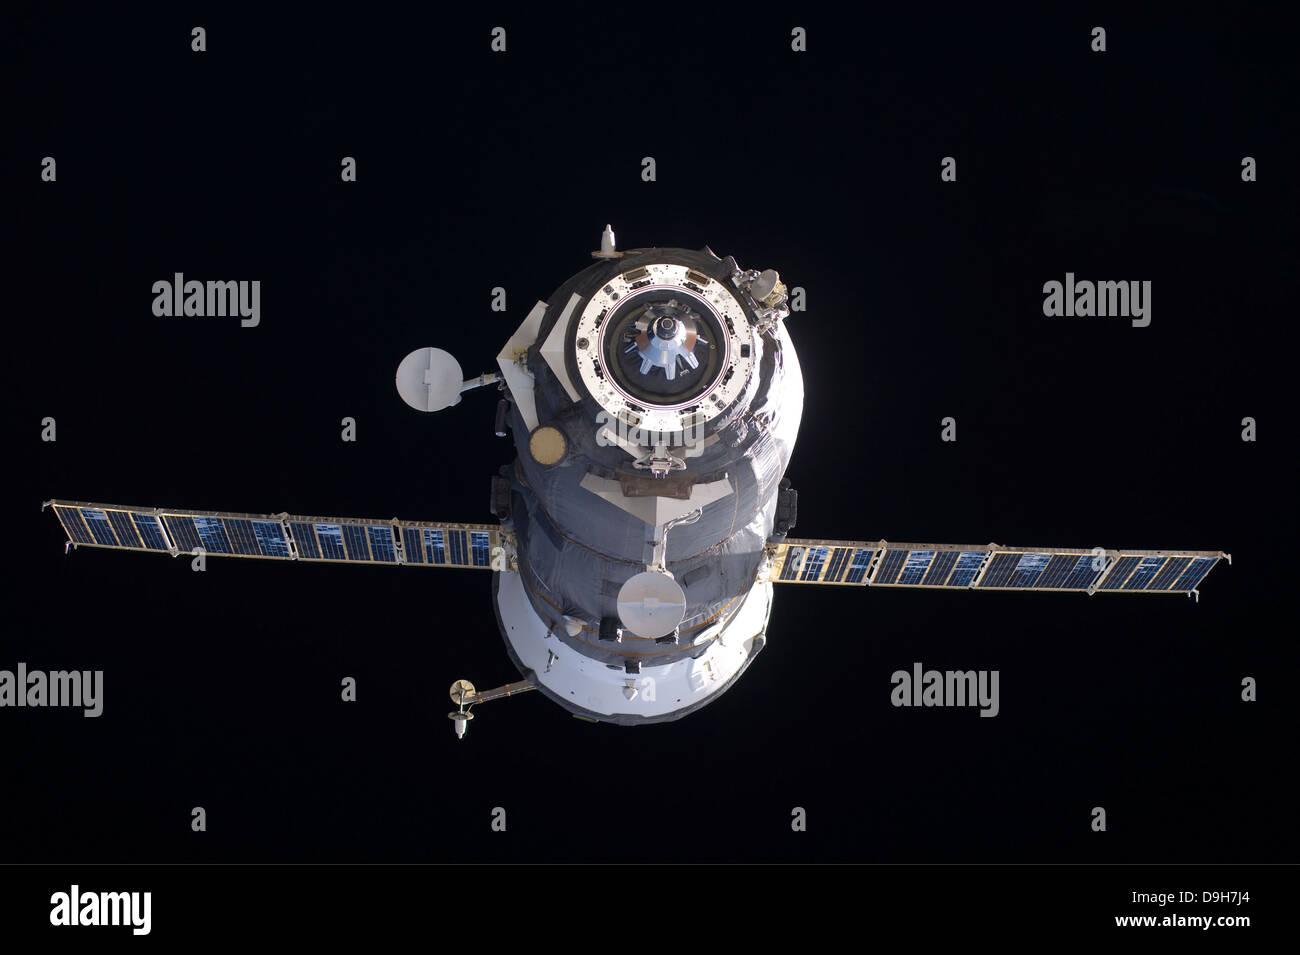 The Progress 40 resupply vehicle in orbit - Stock Image